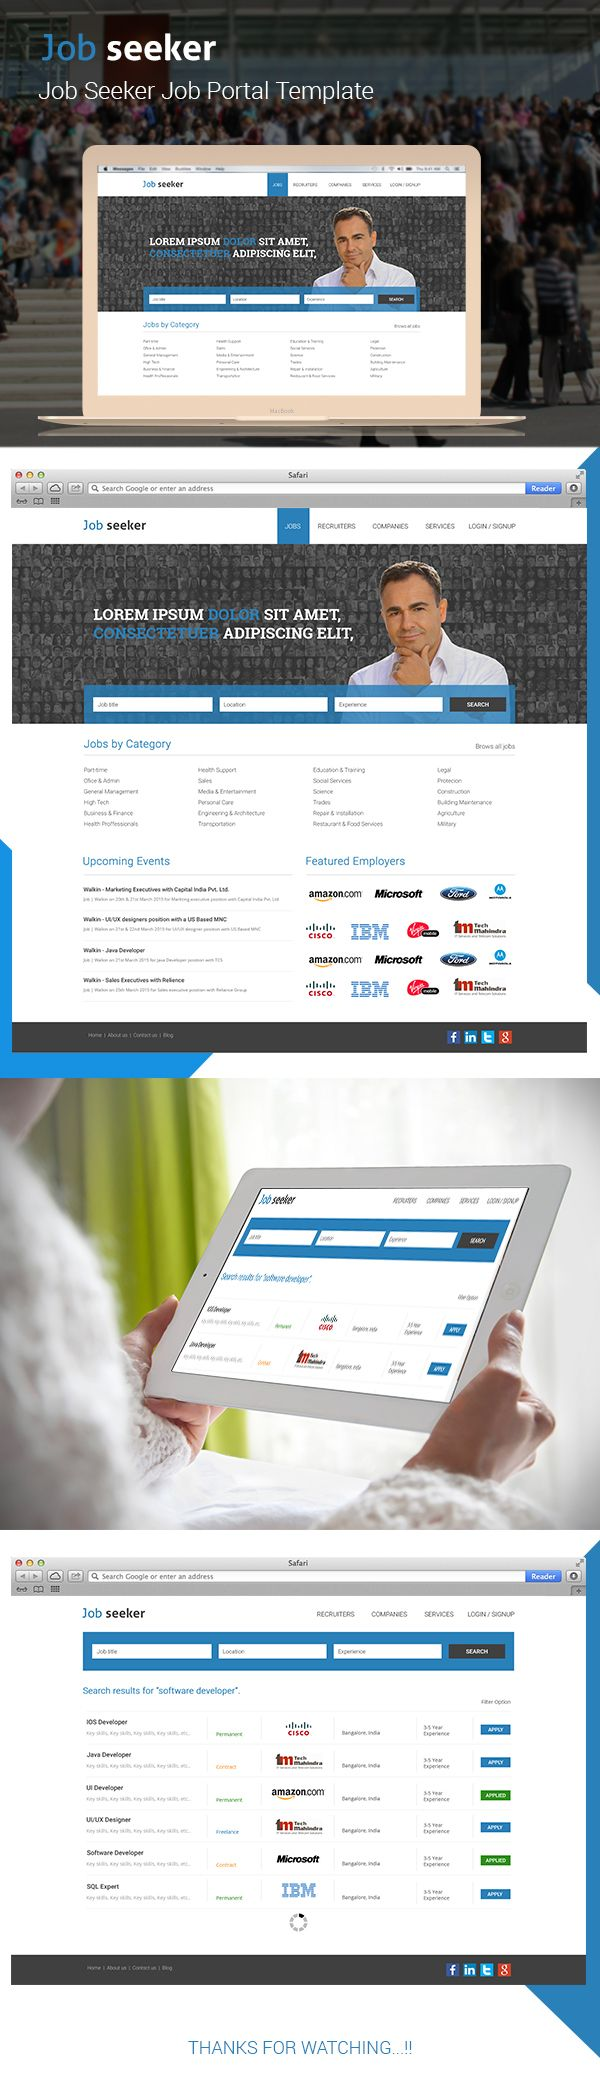 Job seeker - Job Portal Template on Behance